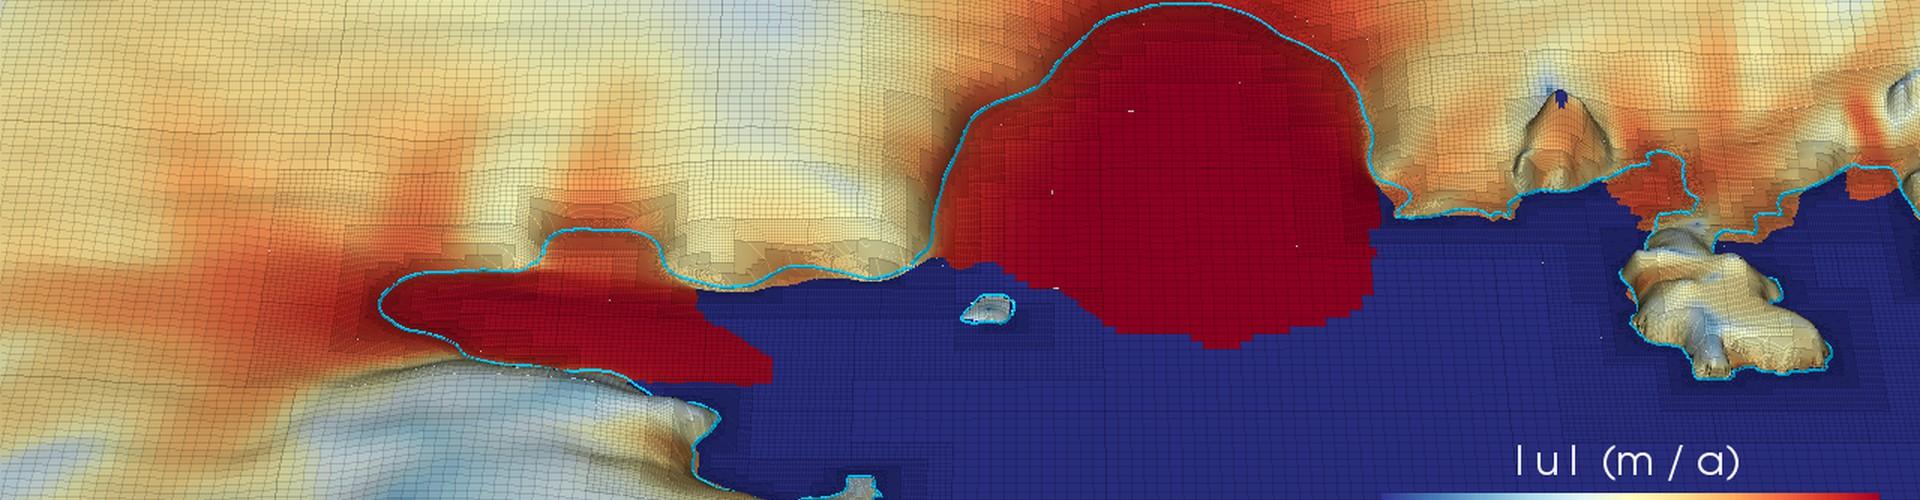 Retreat in the Amundsen Sea Embayment in 2154 (Credit: Cornford et al., The Cryosphere, 2015)